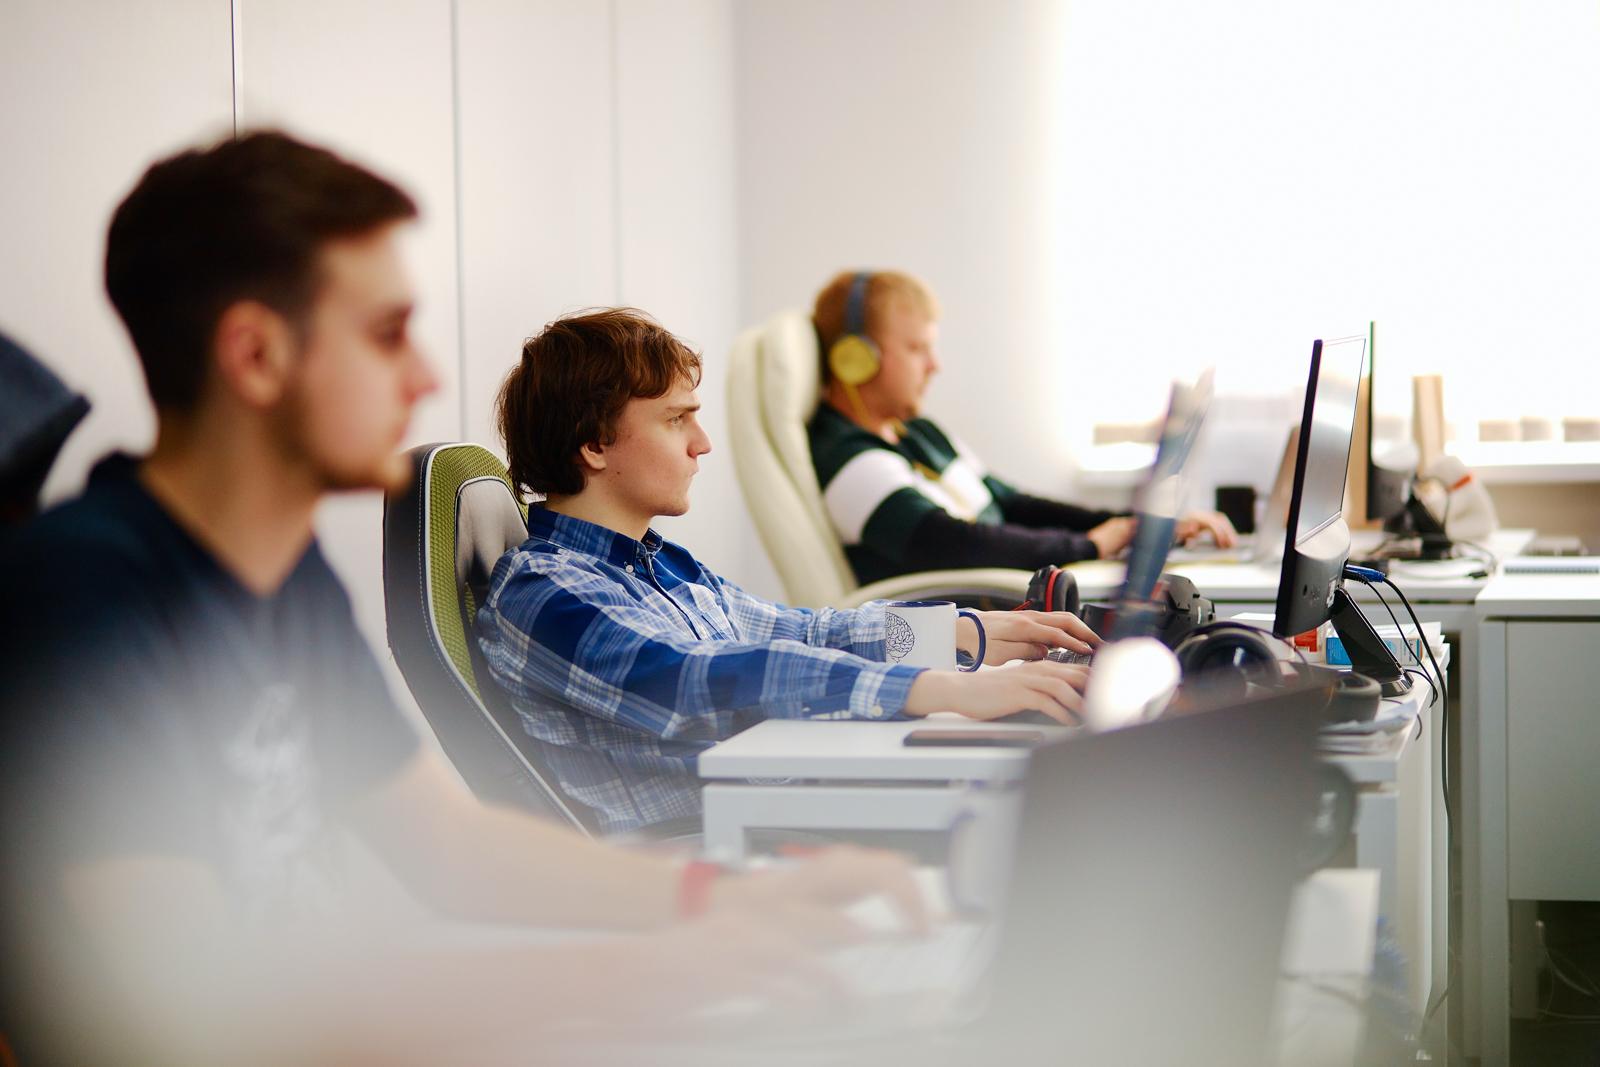 Guys develop custom software at Smart It